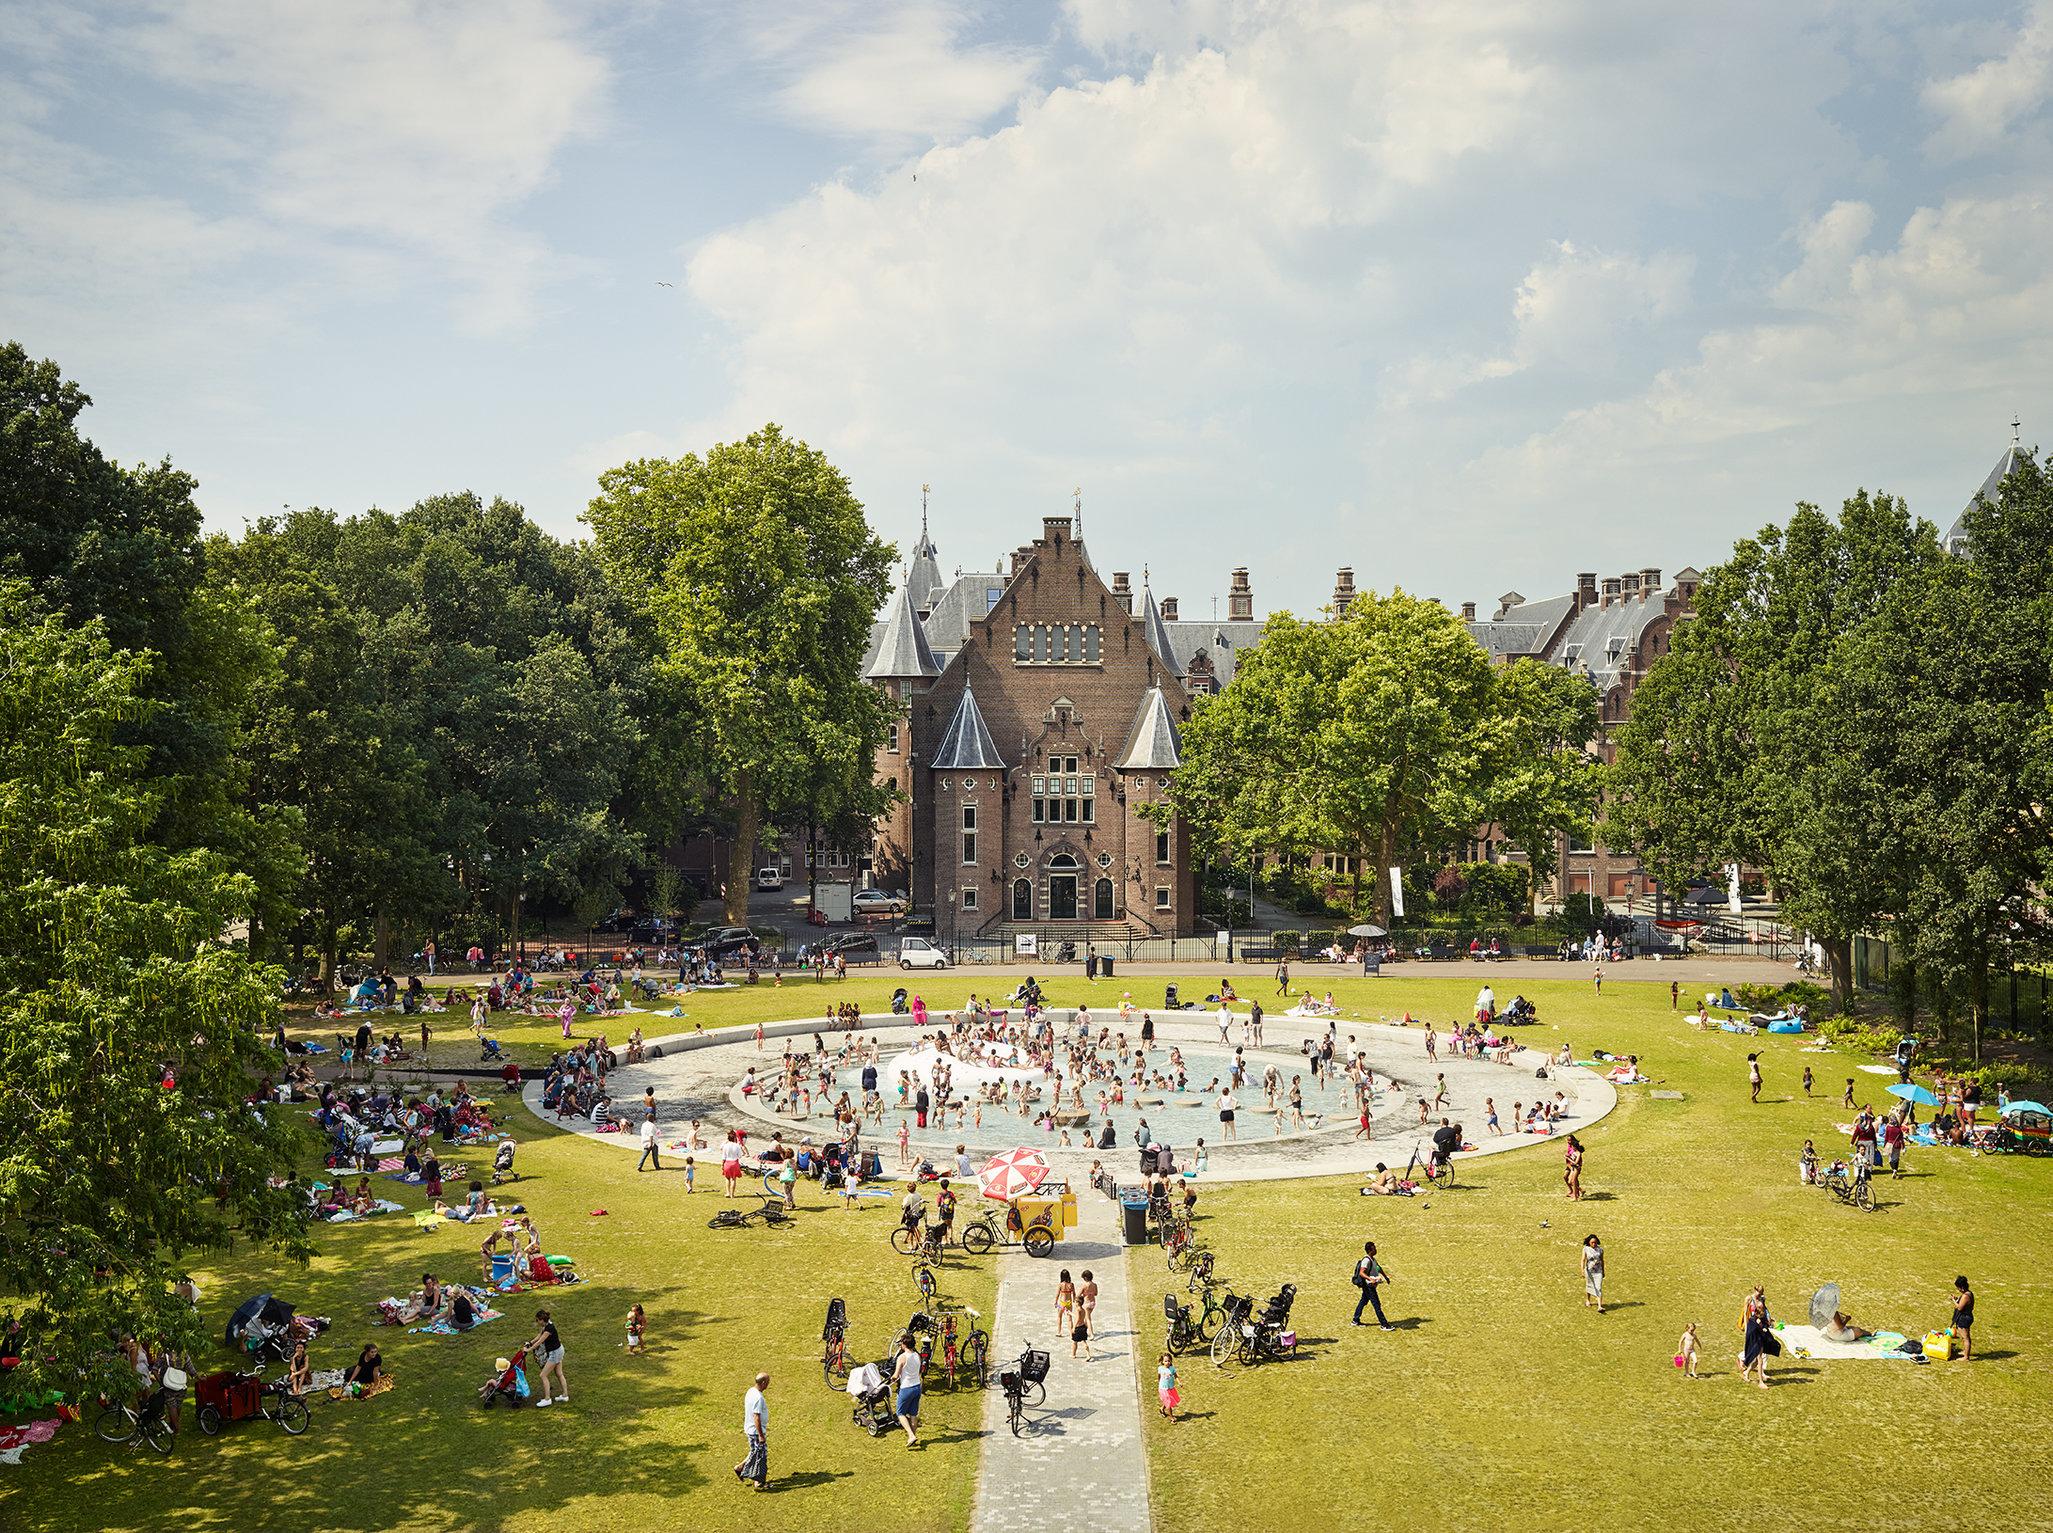 Oosterpark from the series Park © Jeroen Hofman